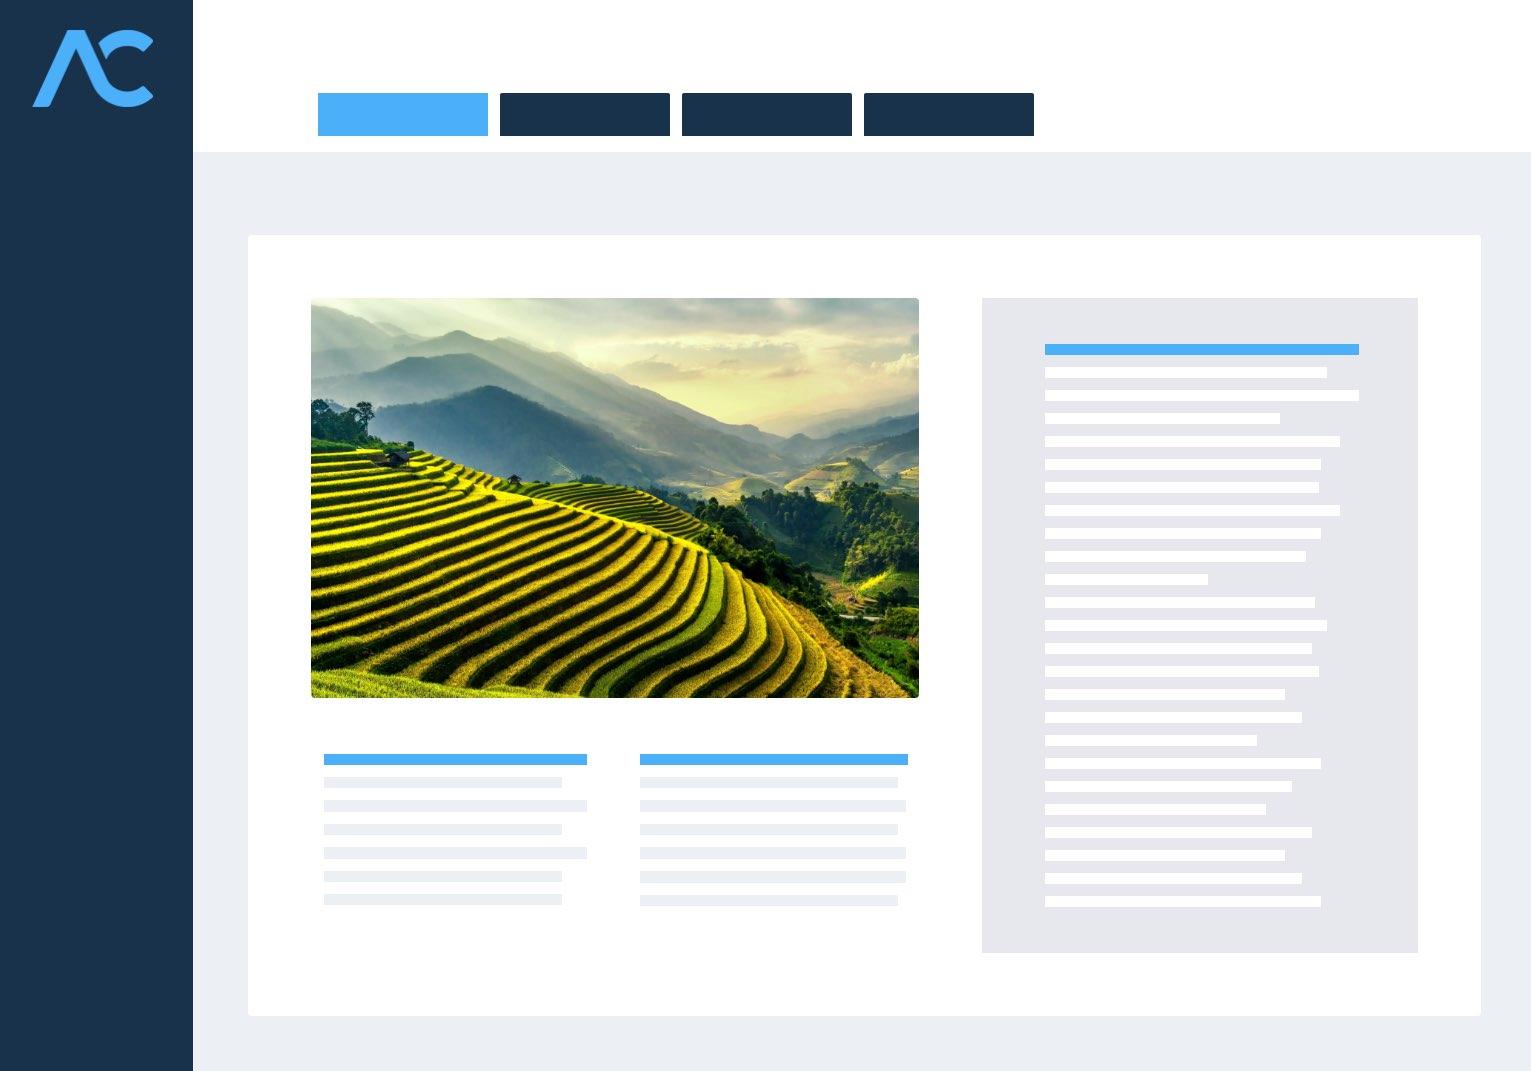 Mockup image licensing in the Digital Asset Management of AdmiralCloud